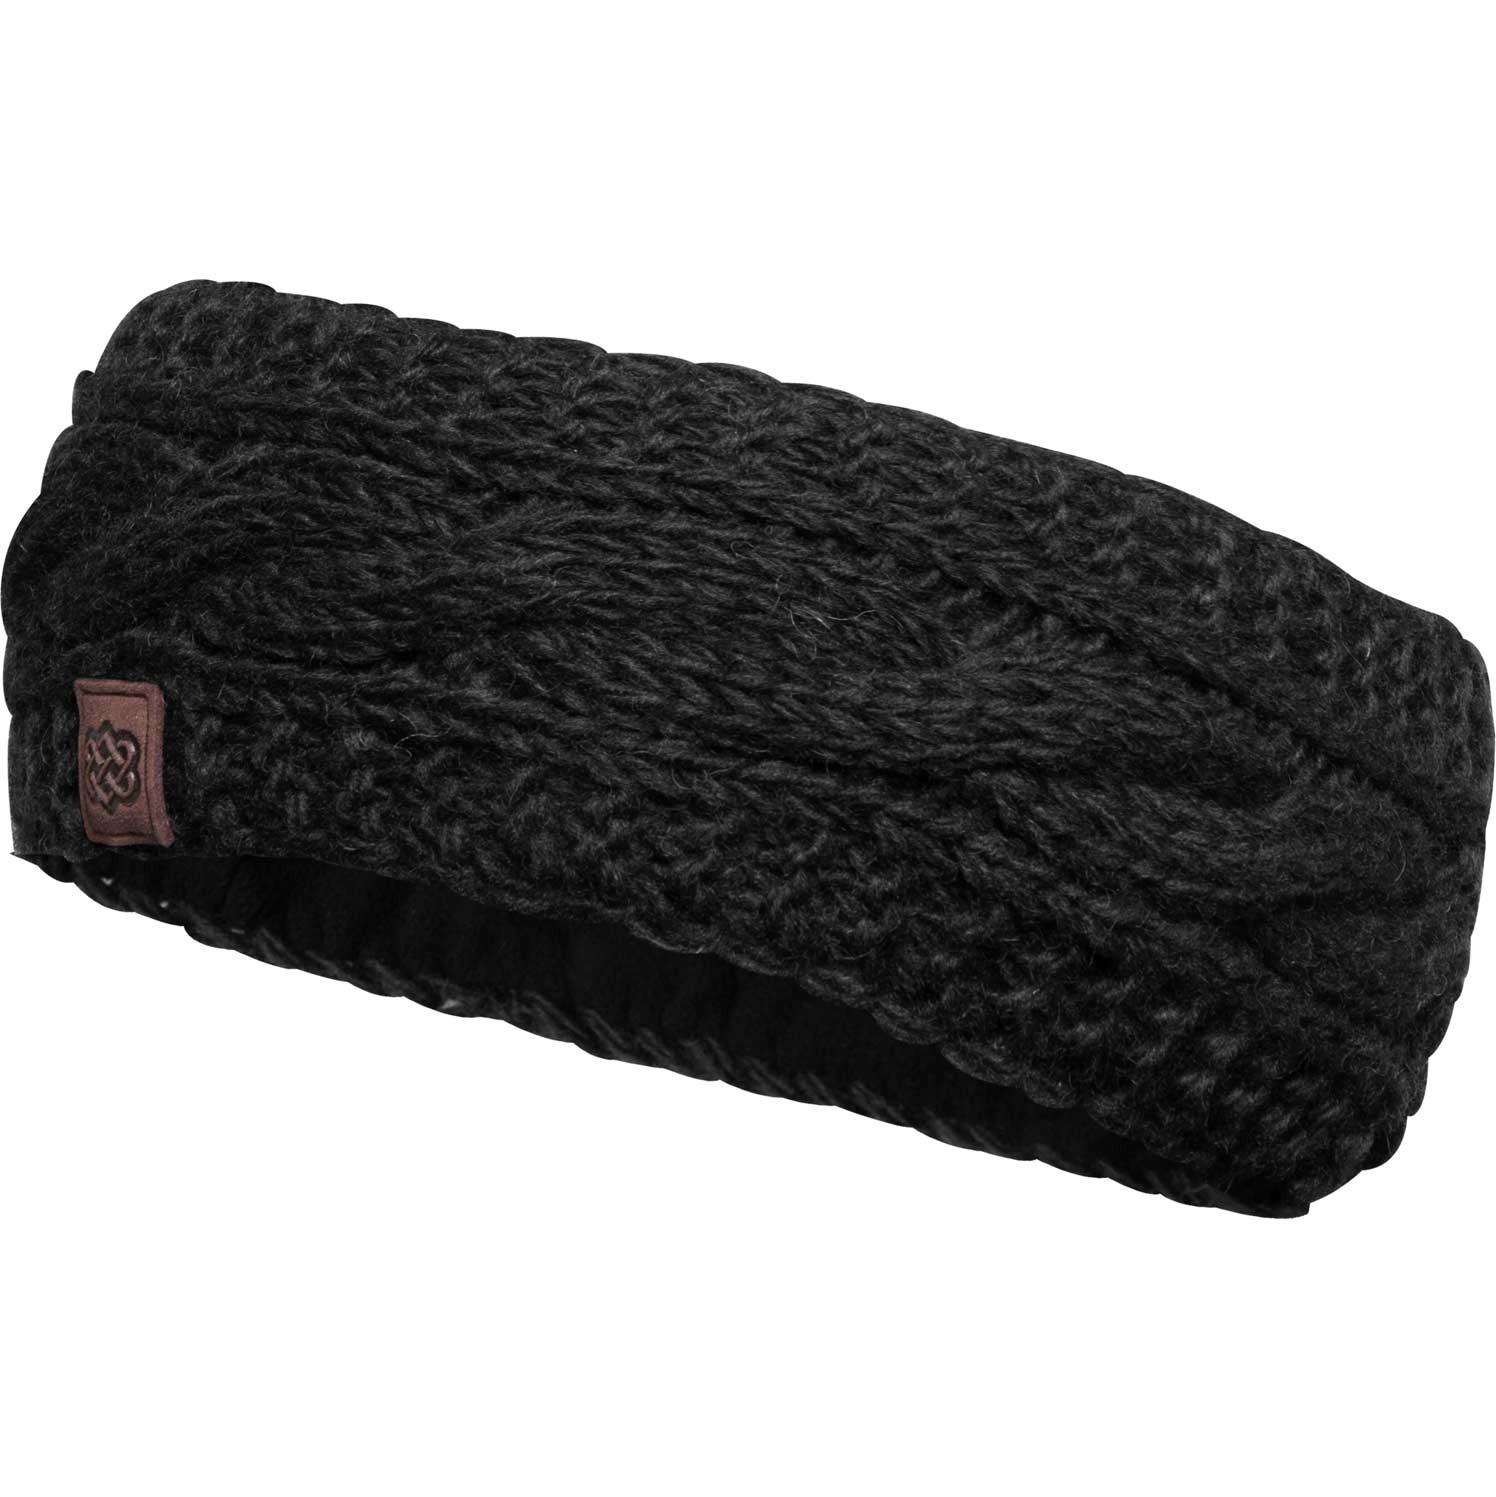 Sherpa Kunchen Headband - Kharani